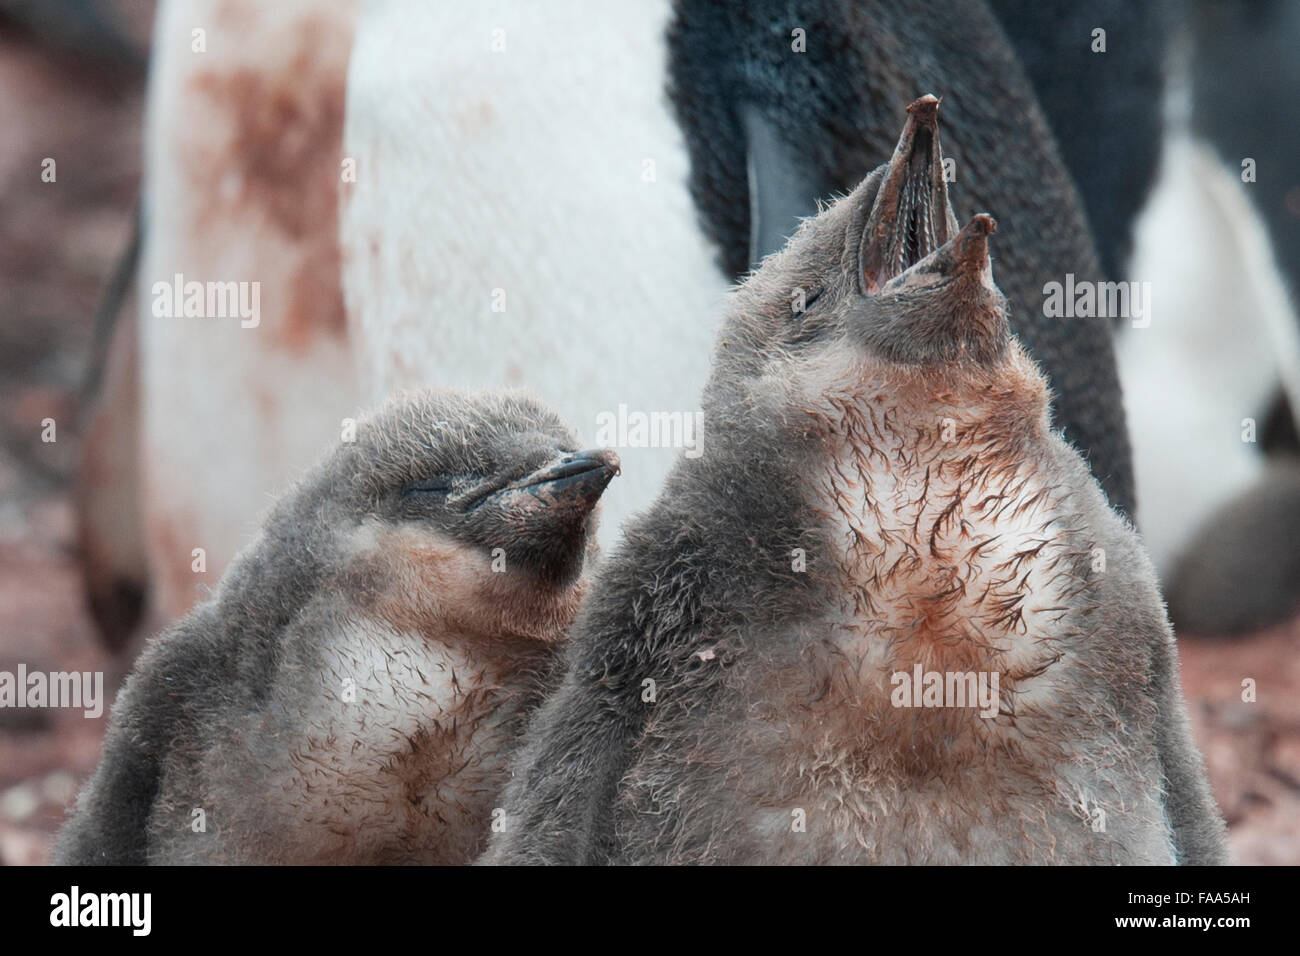 Kinnriemen-Pinguin-Familie mit zwei Küken (Pygoscelis Antarcticus), Hannah Point, antarktische Halbinsel. Stockbild